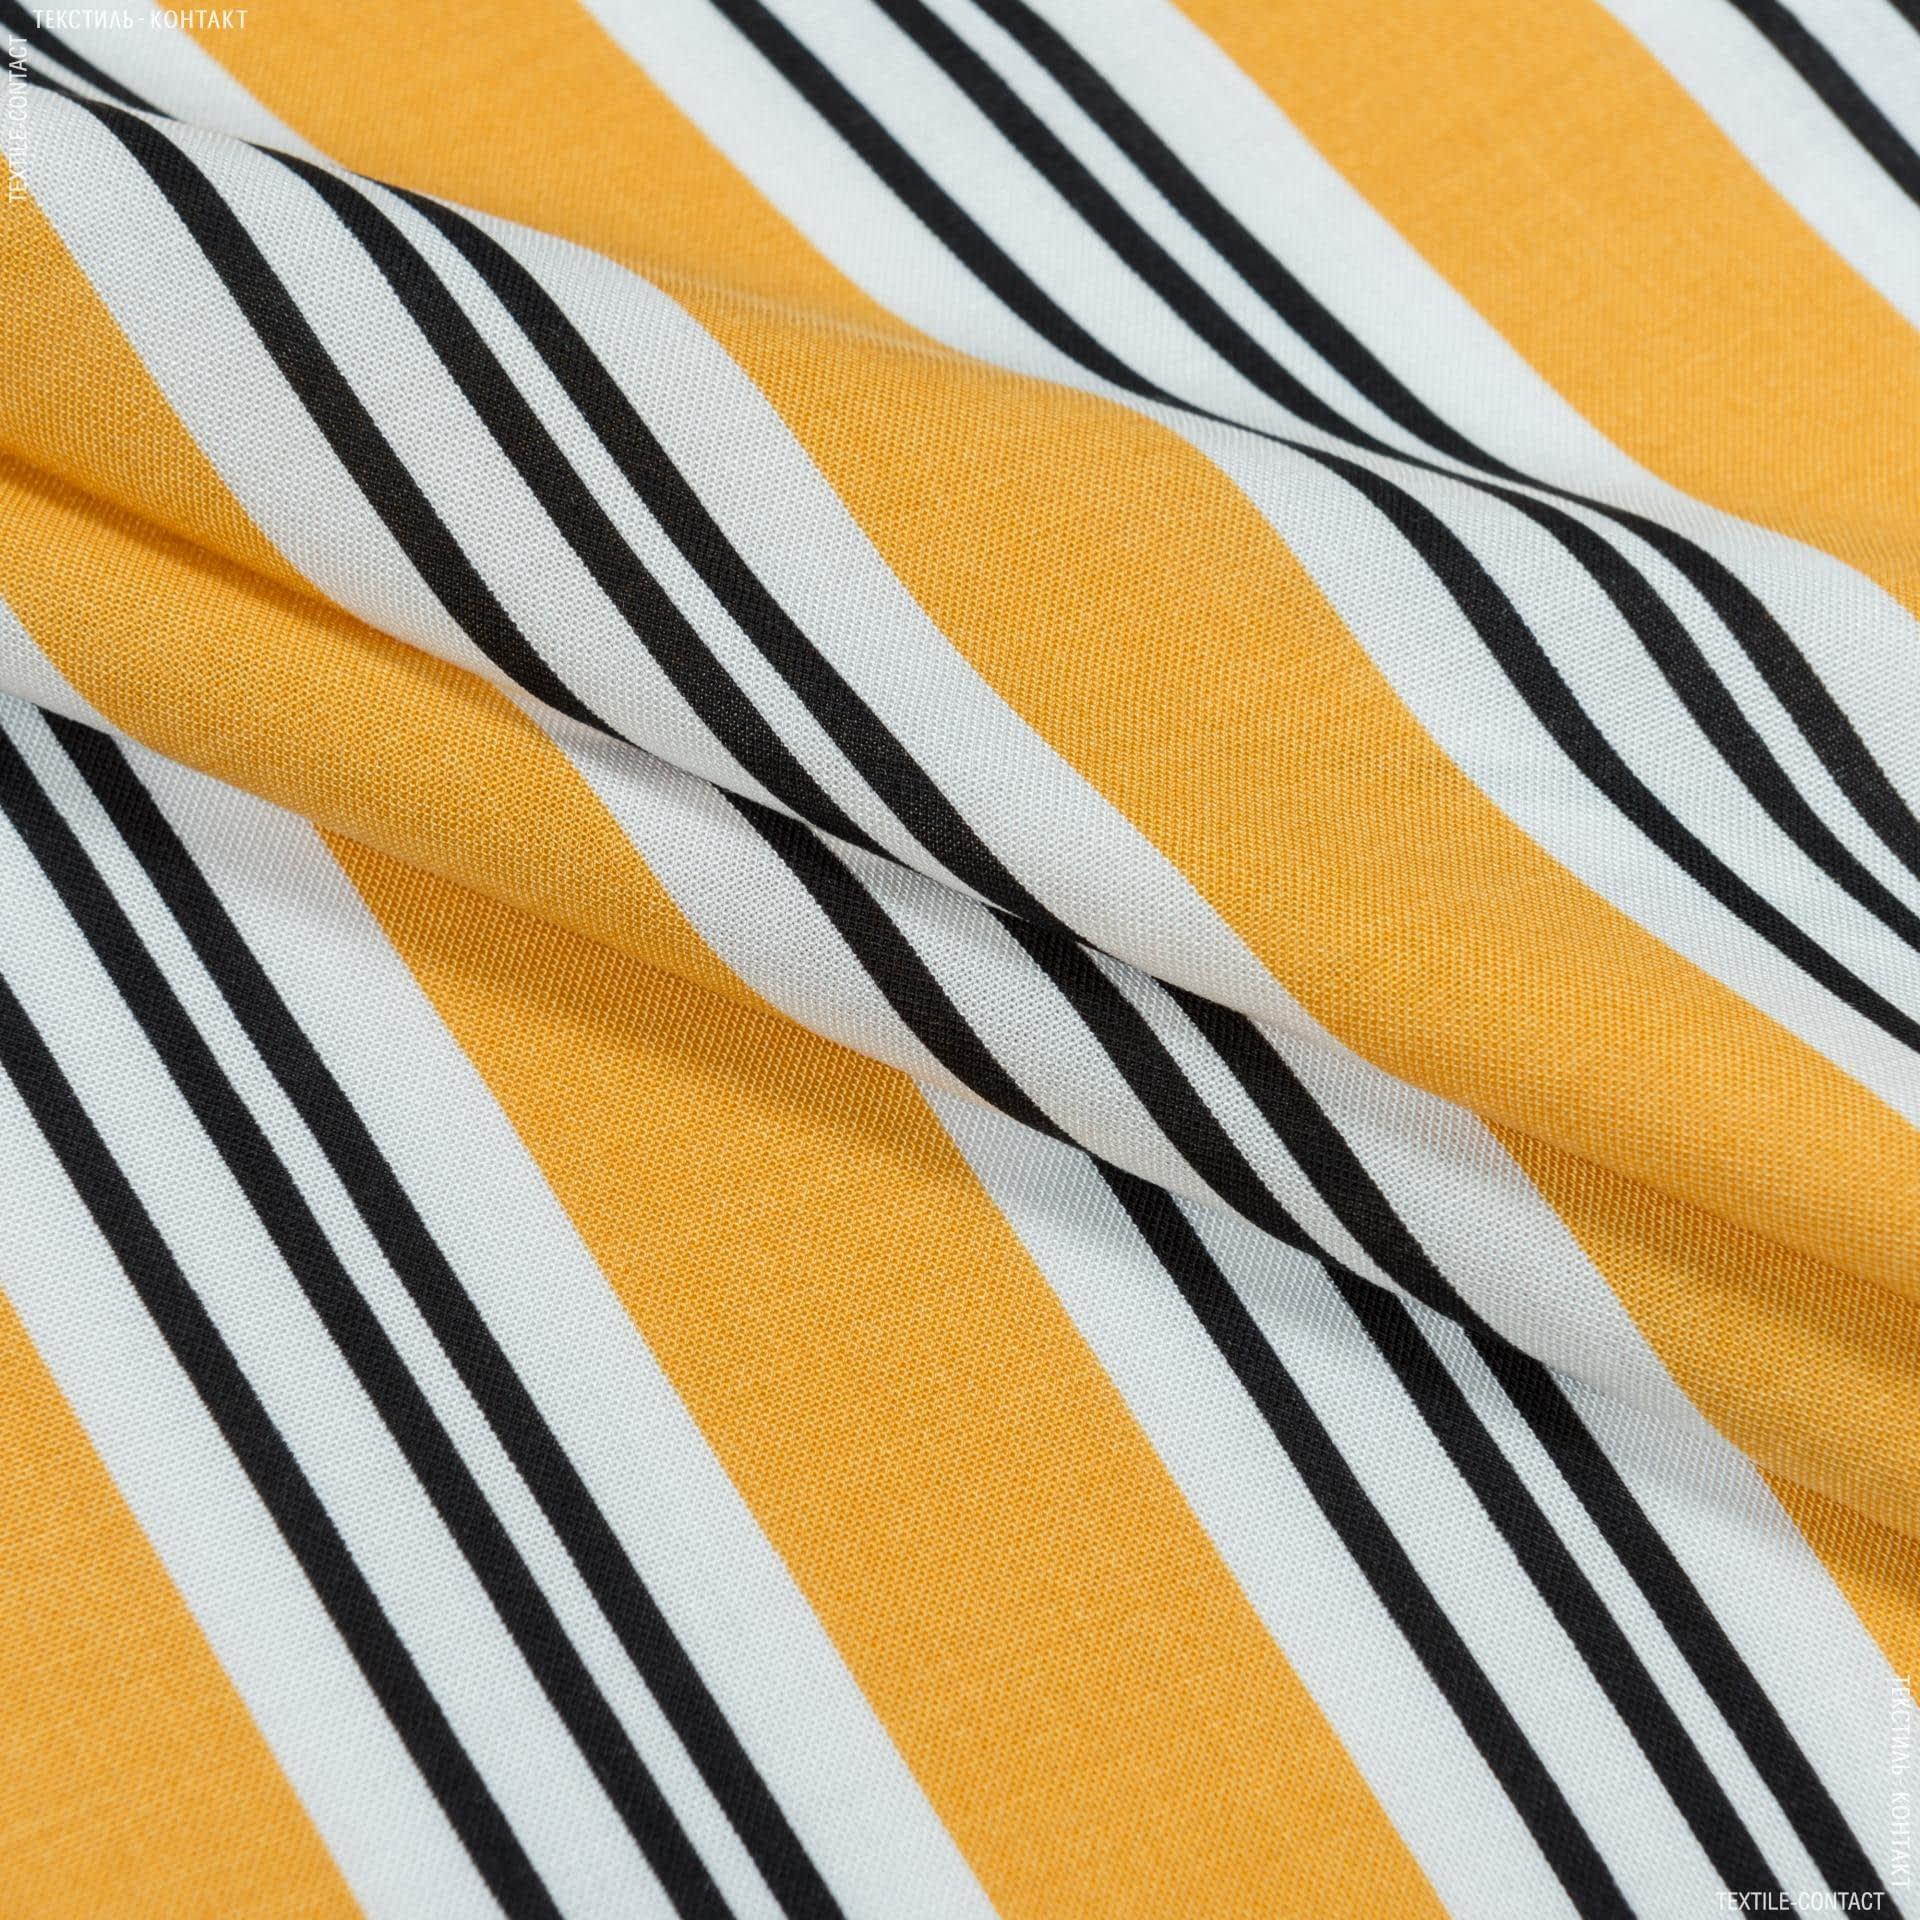 Тканини для хусток та бандан - Штапель фалма принт